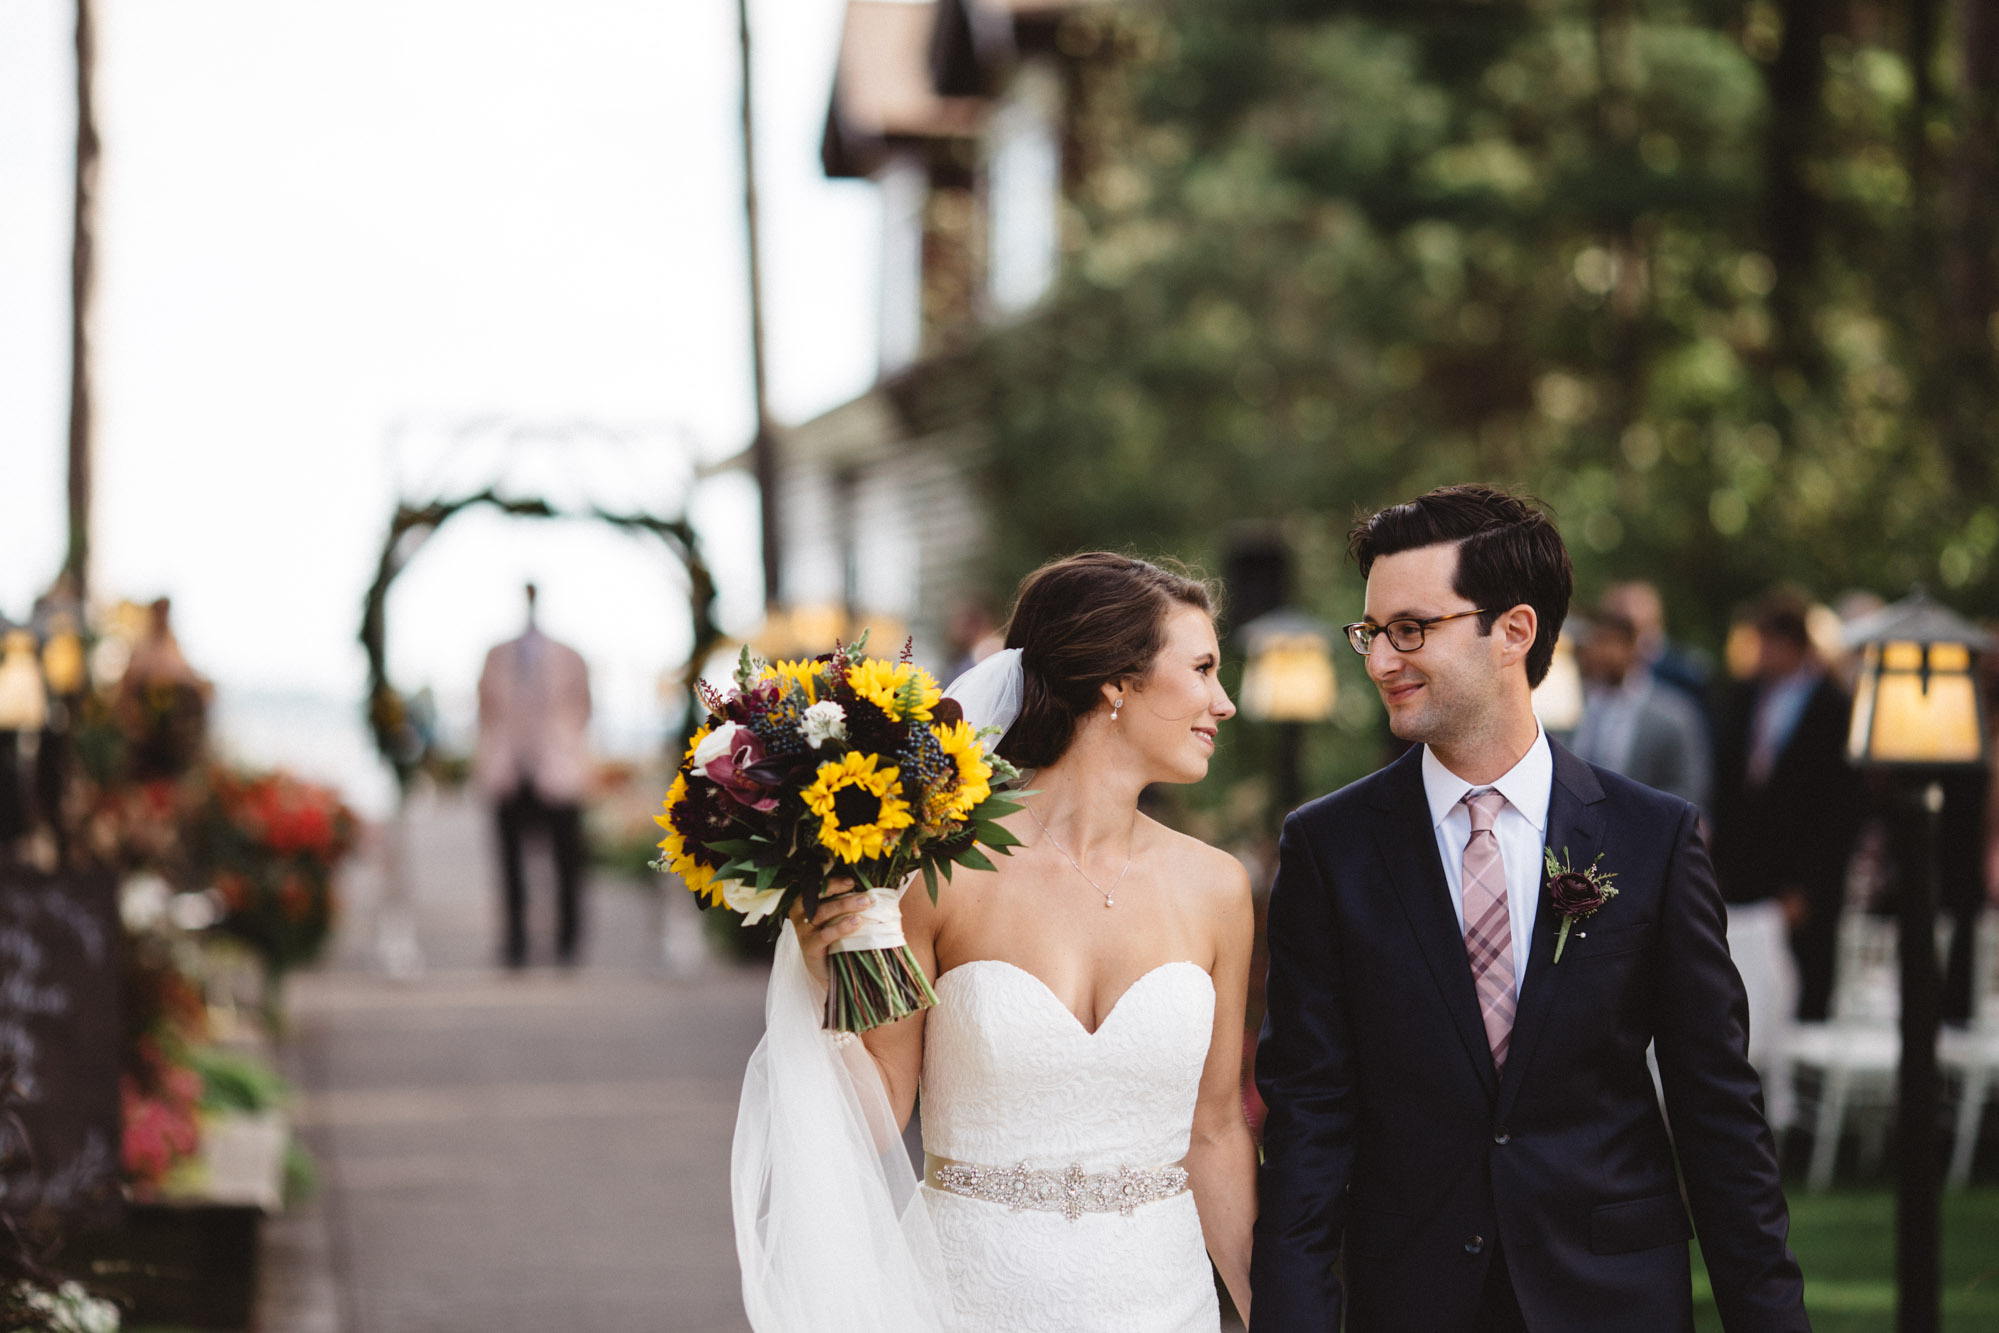 Timeless wedding photography at Grand View Lodge by Britt DeZeeuw, Brainerd MN photographer